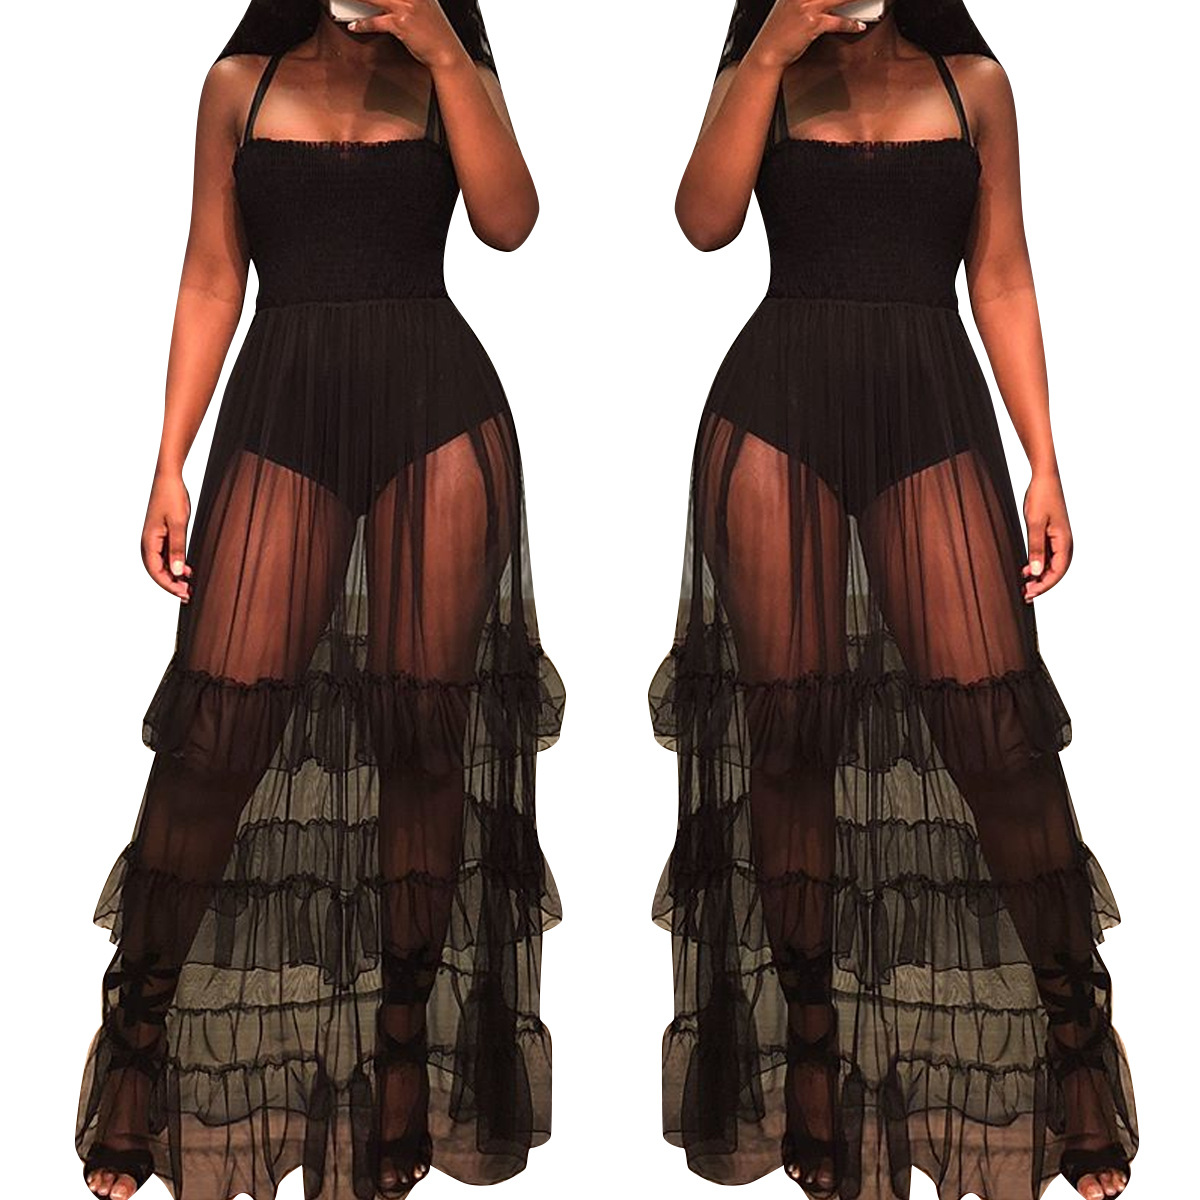 Black Sexy Bustier Party Mesh Dress 2018 New Bandeau Sleeveless See through Strap Dress Sheer Beach Women Summer Elegant Dress